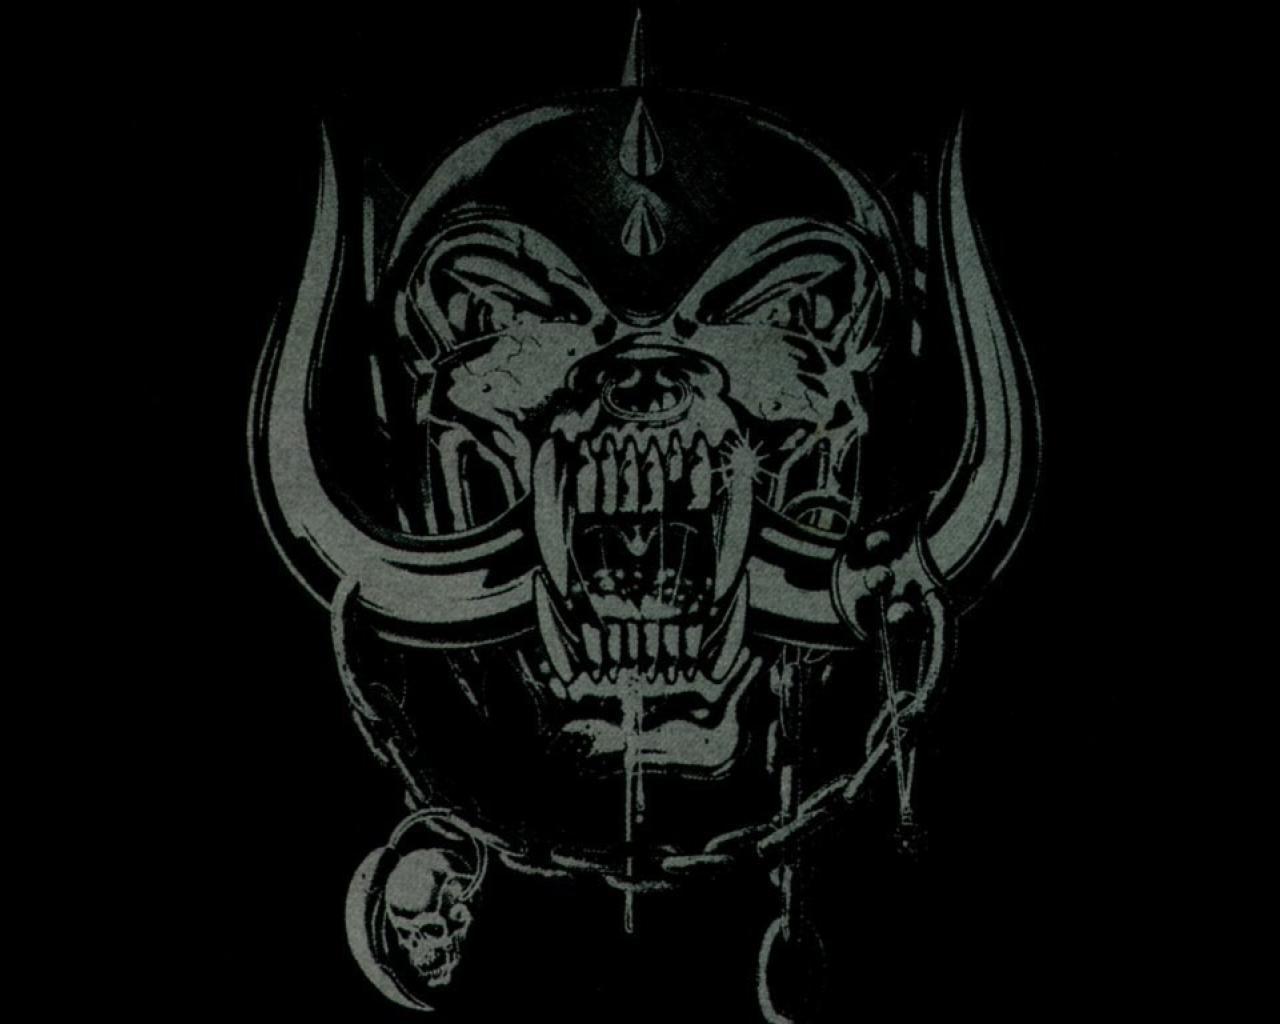 Lemmy Kilmister Rock Music Motorhead Wallpaper Hd: Motorhead Wallpaper HD